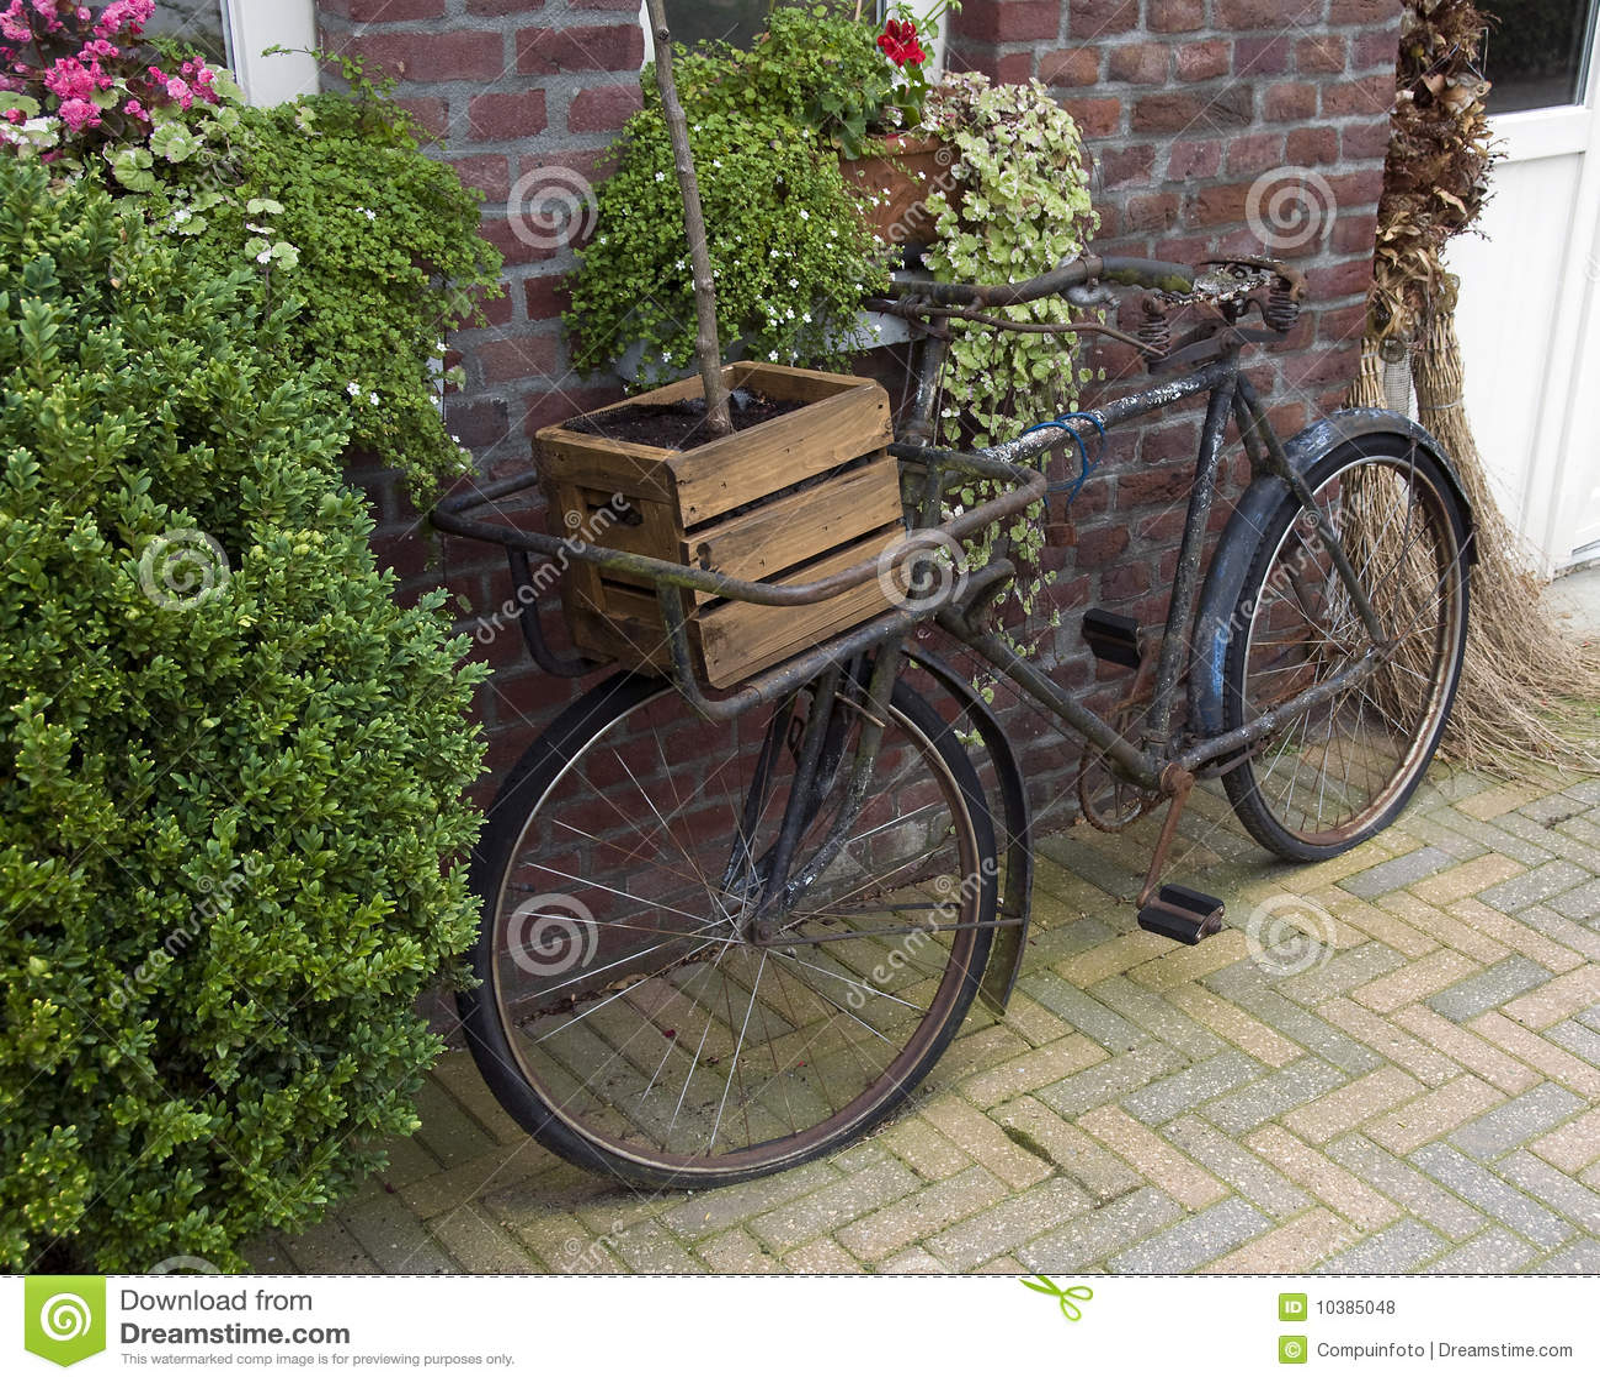 altes fahrrad stockfoto bild von blatt immergr n antike 10385048. Black Bedroom Furniture Sets. Home Design Ideas